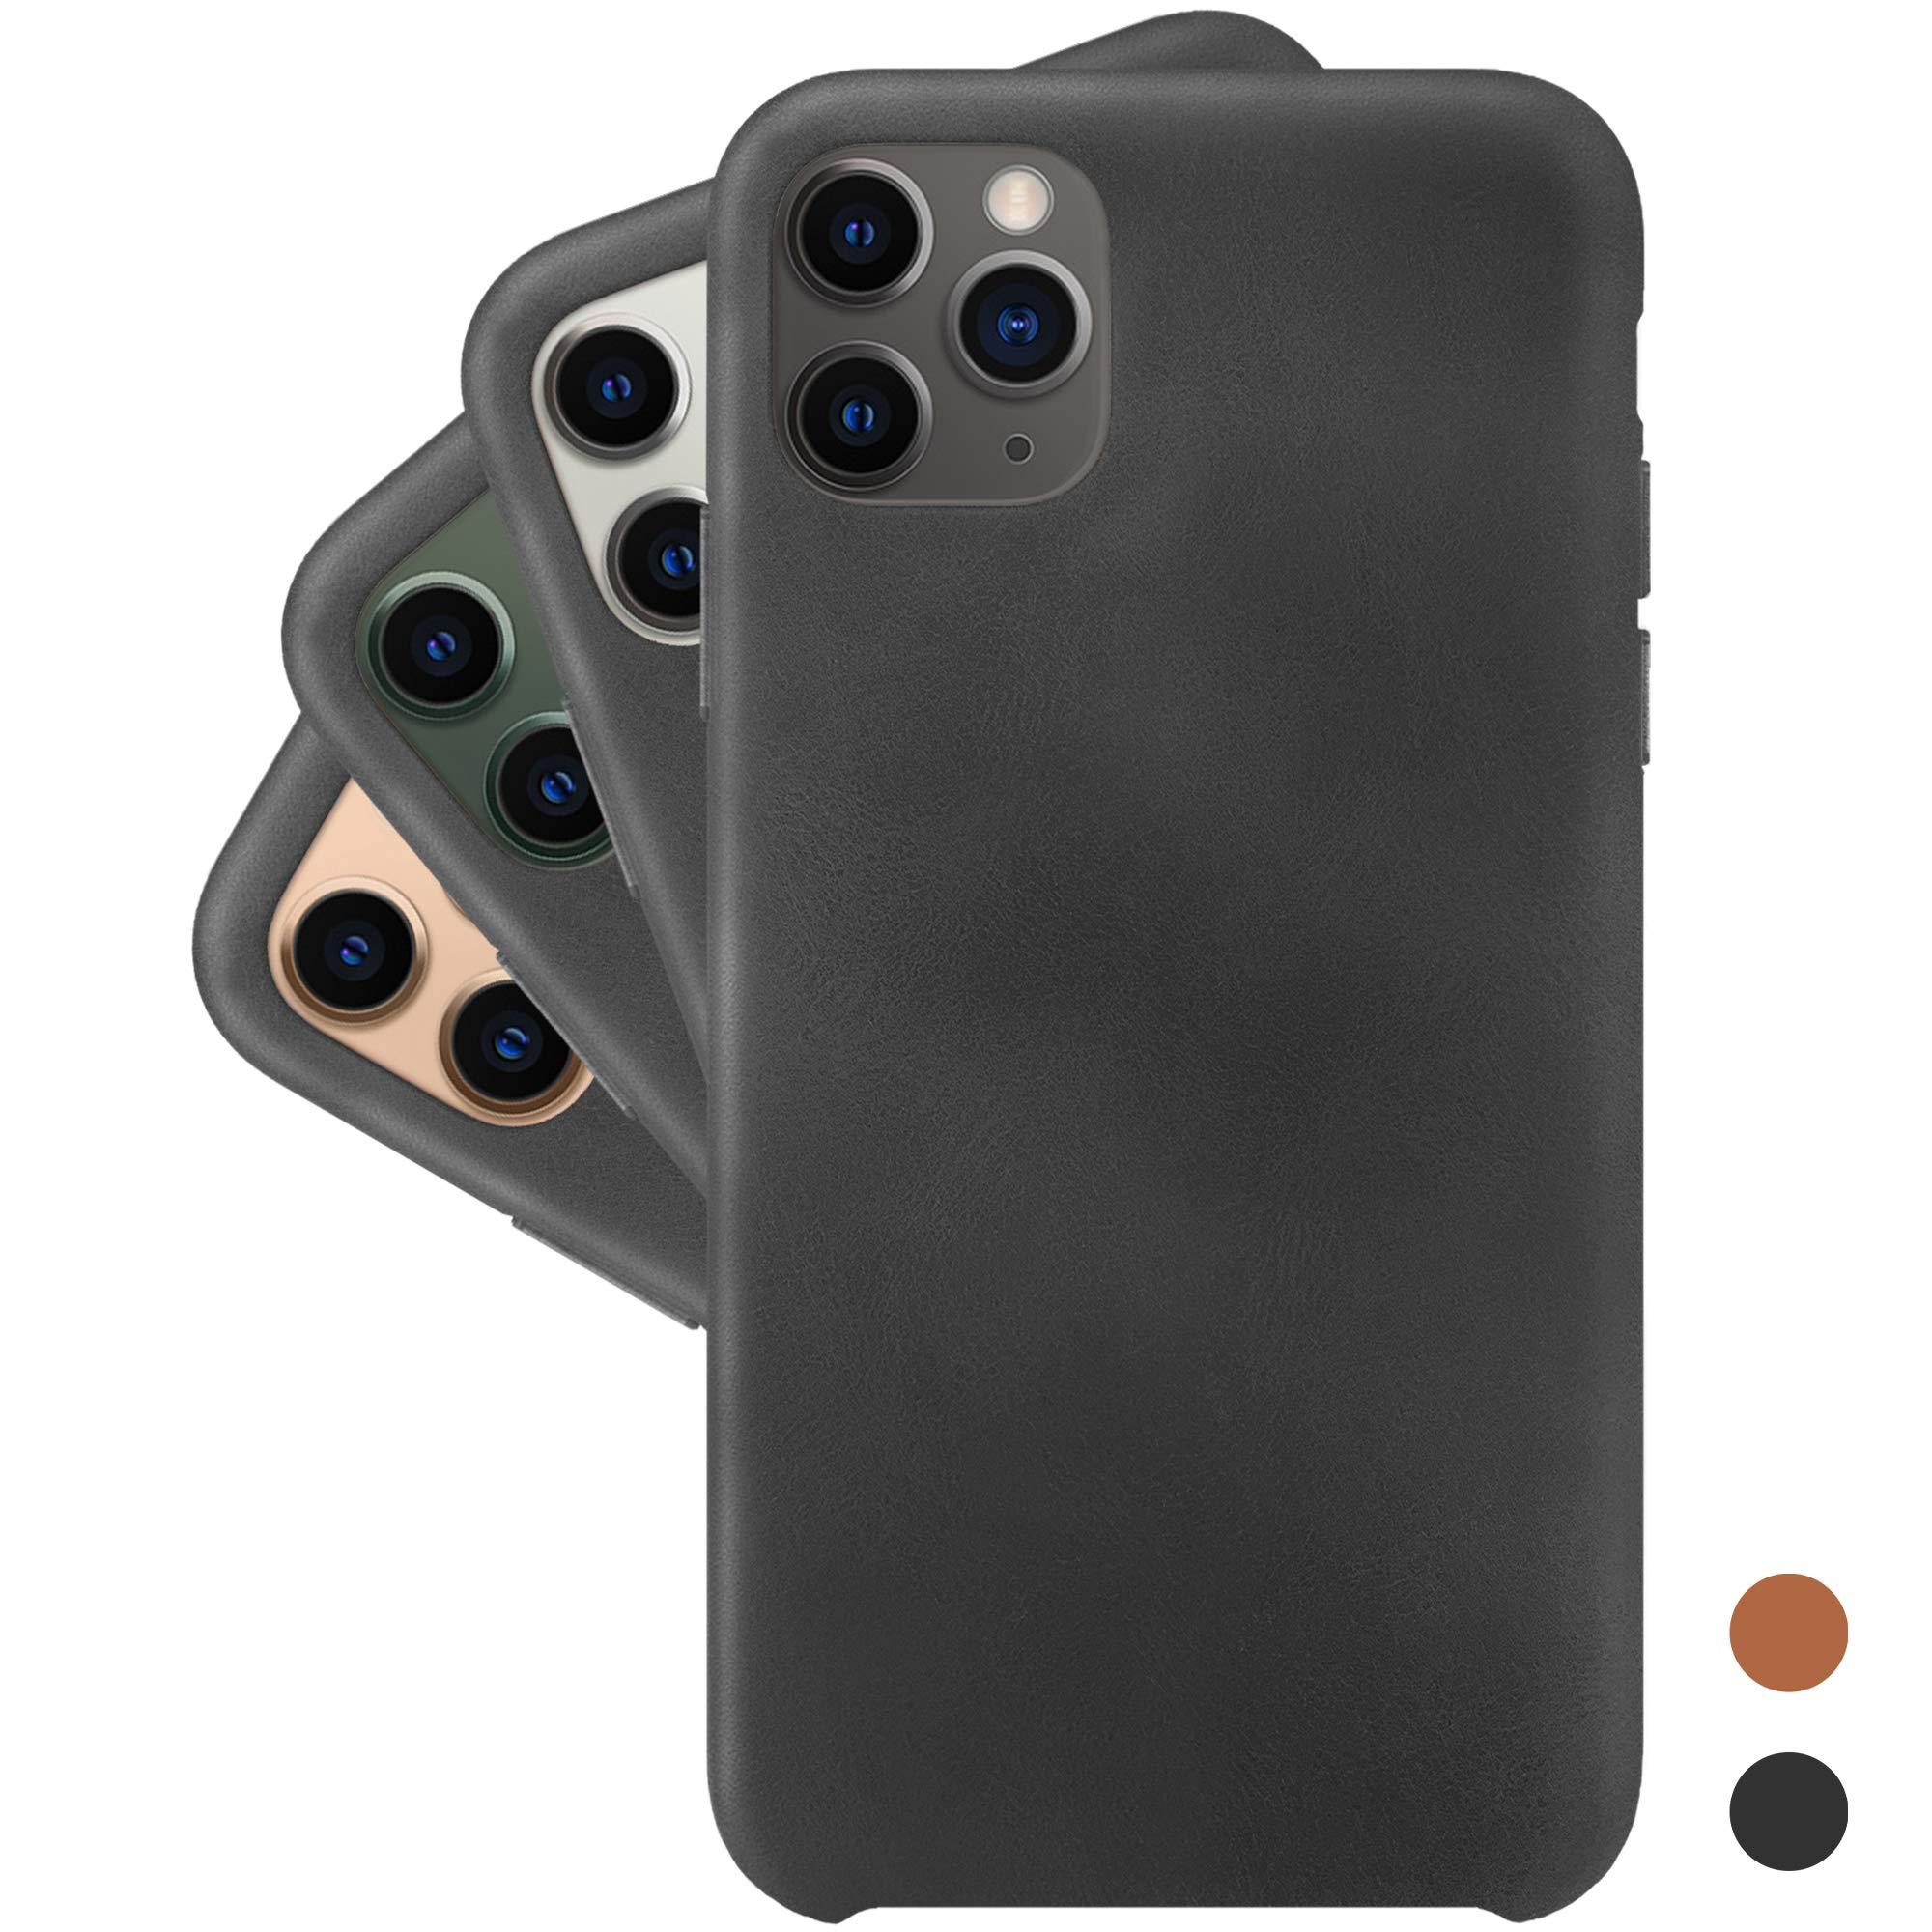 LONLI Basic   Eco-Friendly Vegan Leather Case for iPhone 11 Pro - Black